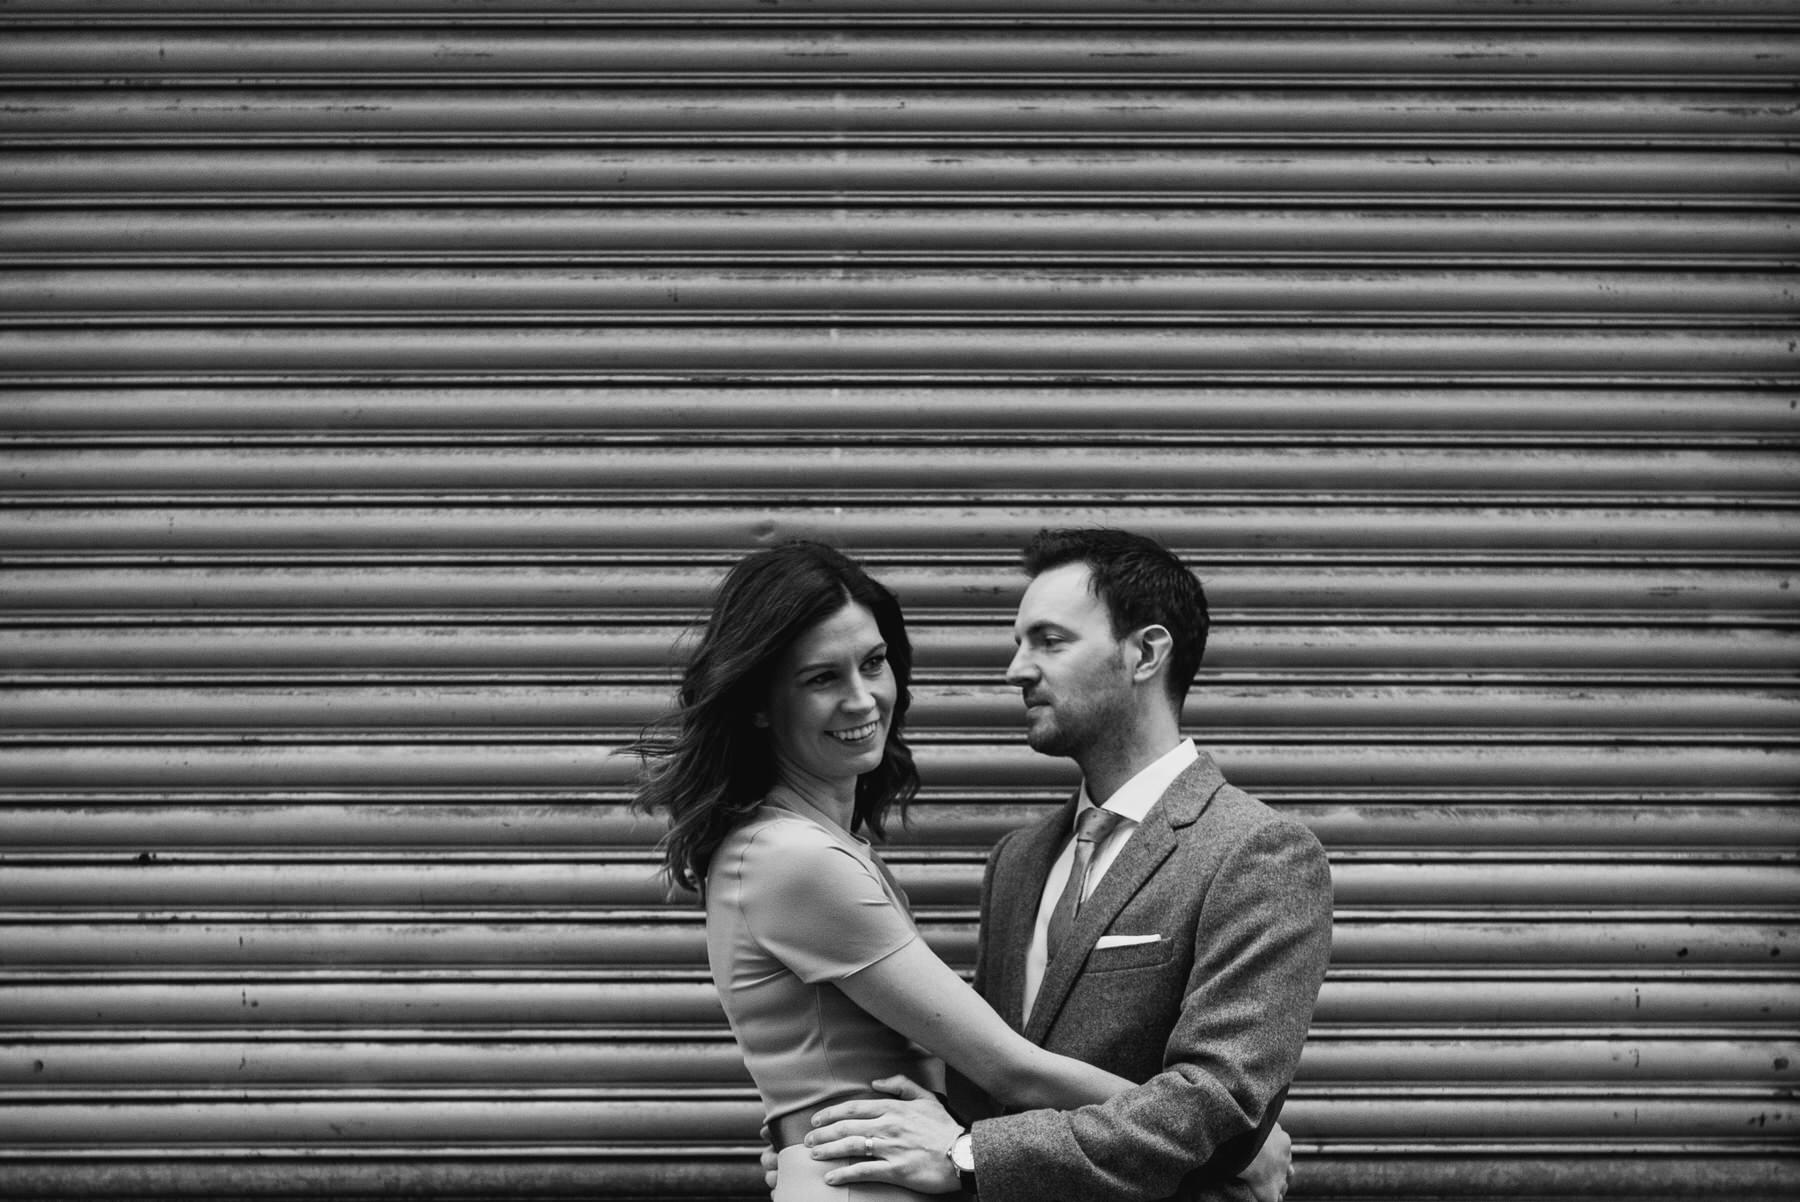 70-BW alternative wedding photographer London.jpg